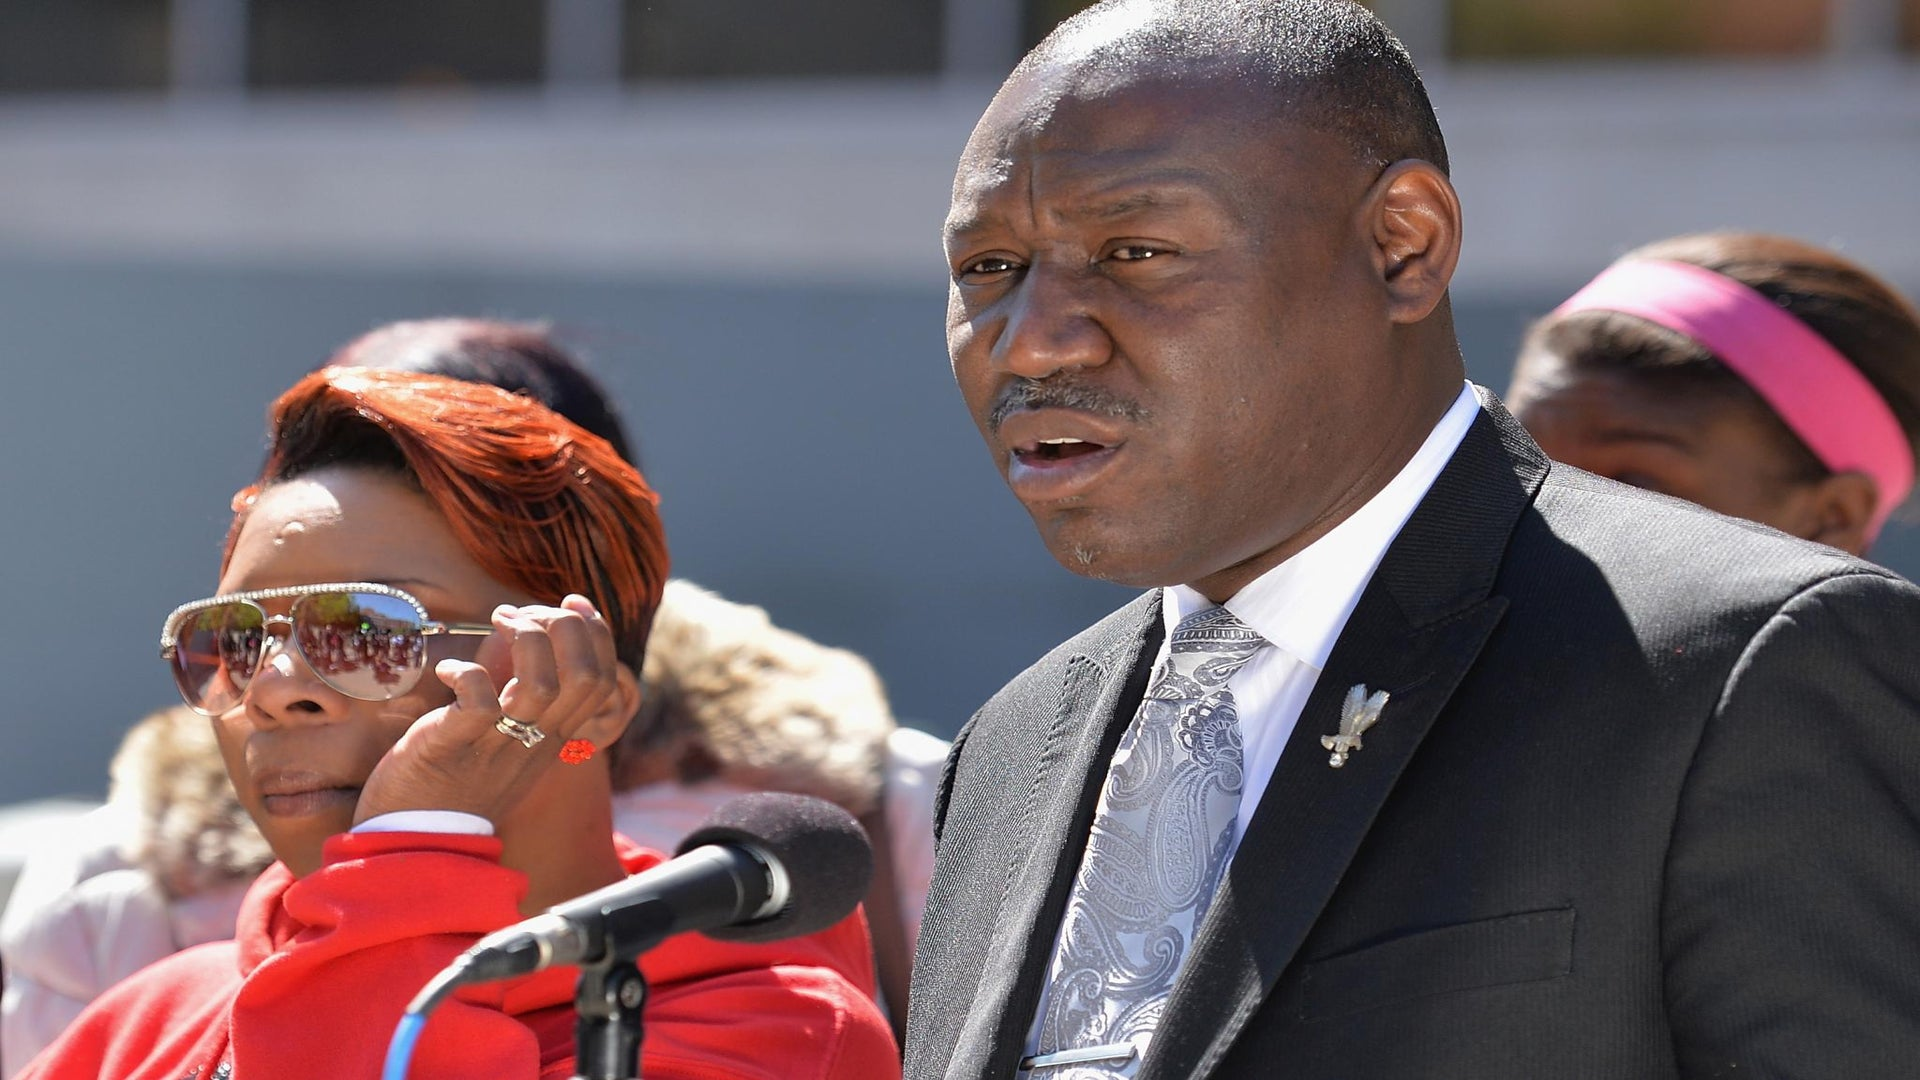 Michael Brown's Family Files Civil Lawsuit Against City of Ferguson